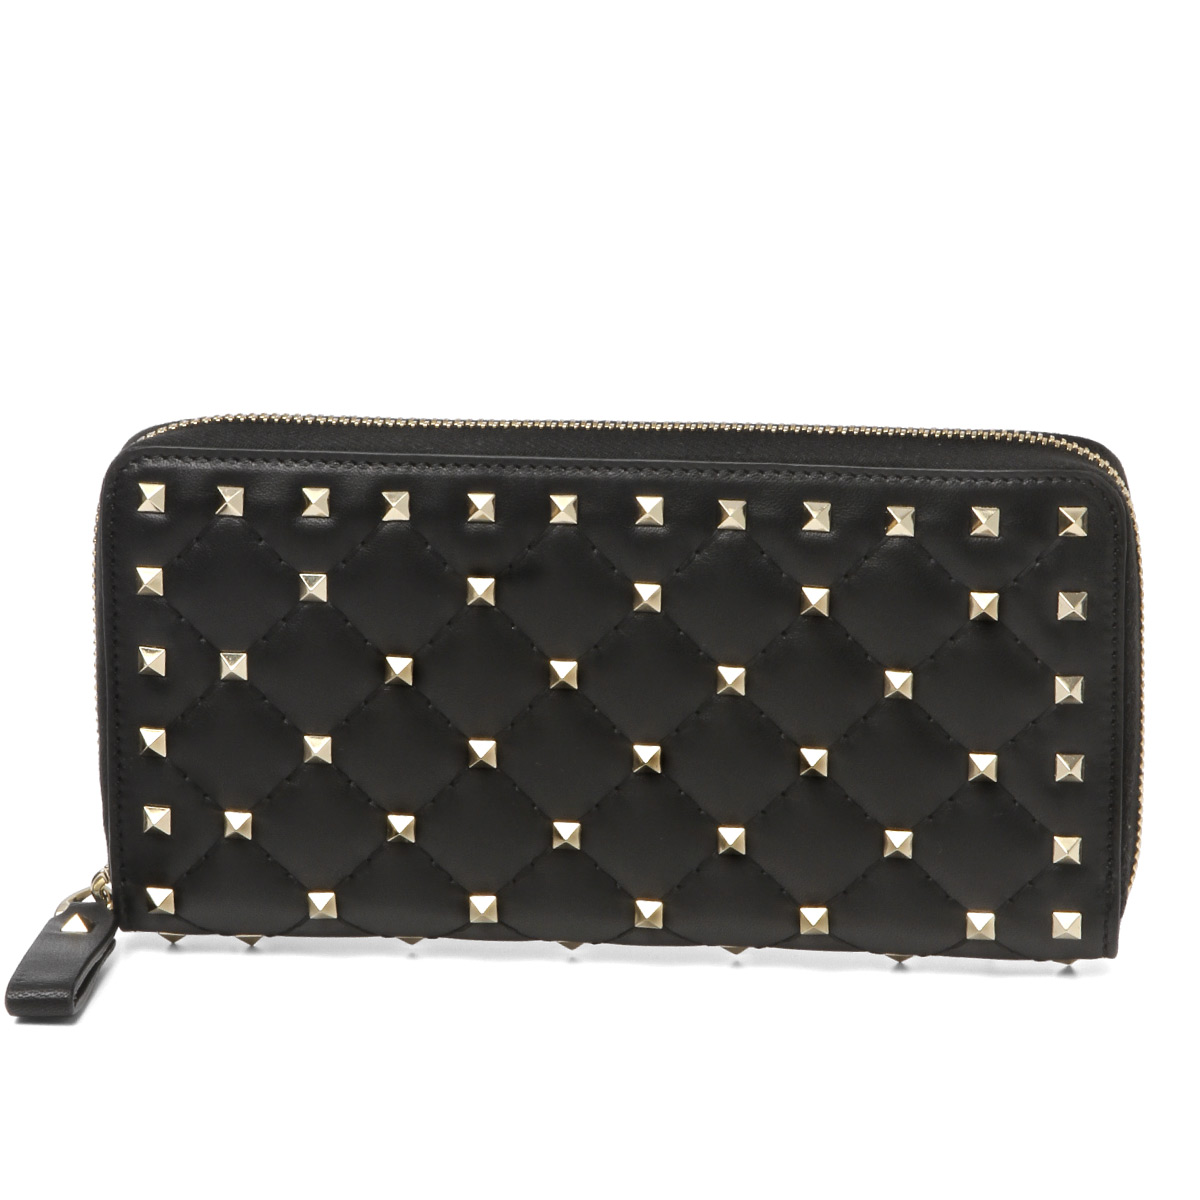 988fc2b1cc8b9 Valentino VALENTINO wallet Lady's PW2P0P00NAP 0NO round fastener long  wallet ROCKSTUD SPIKE lock stud bolt spikes ...